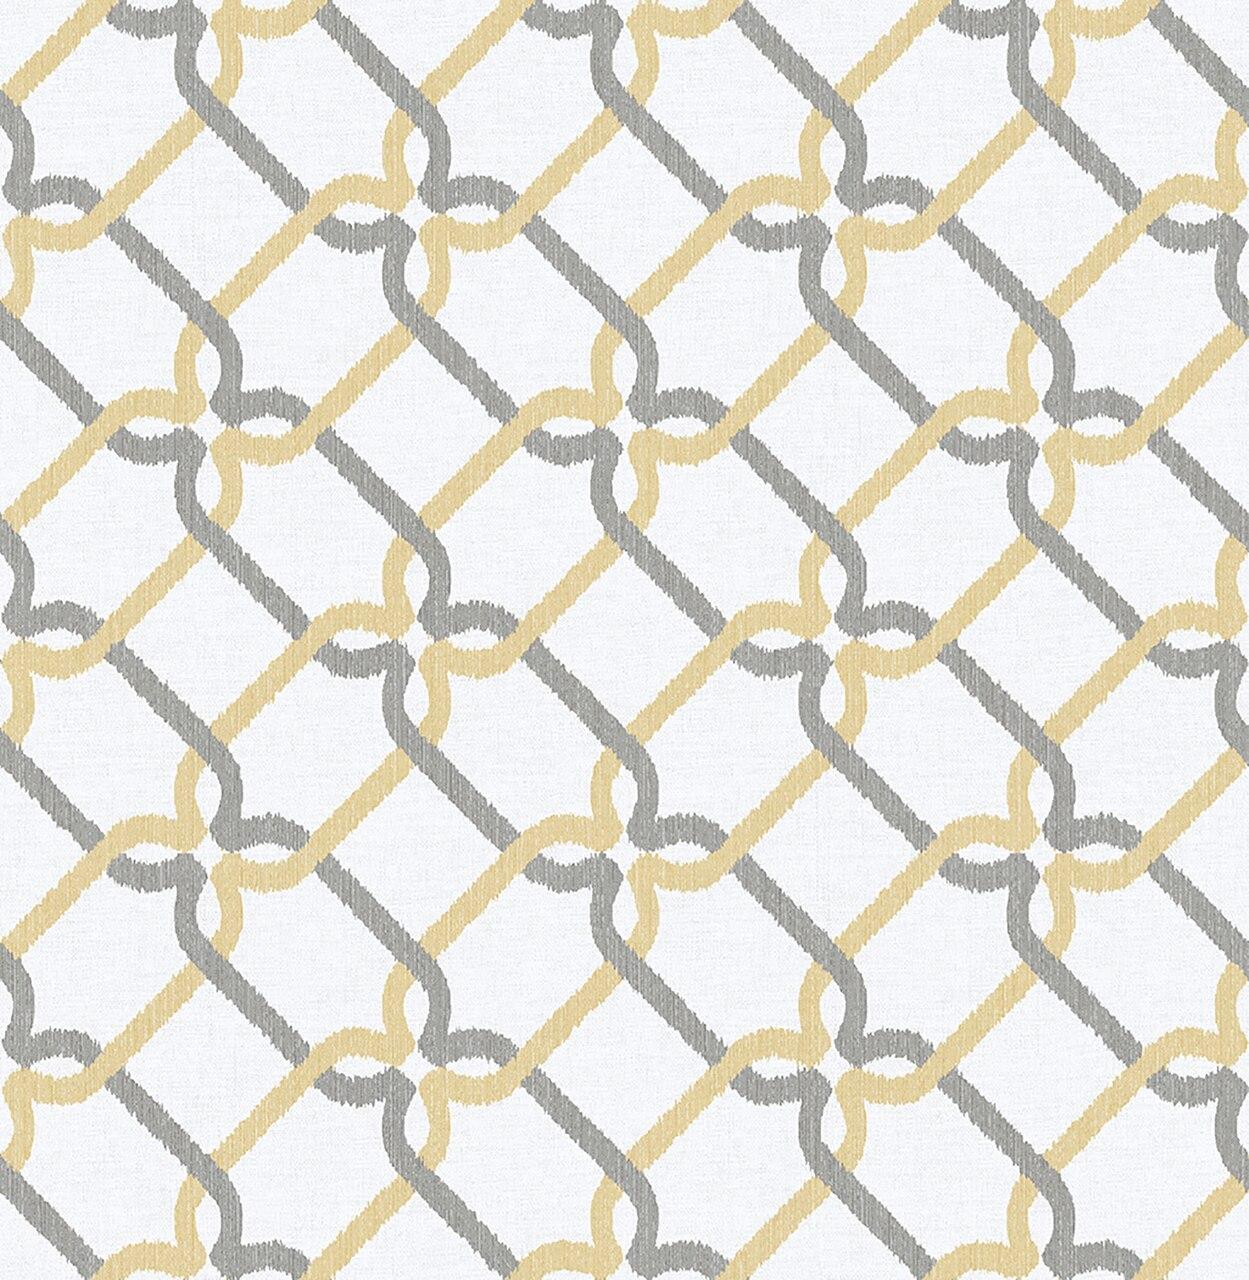 Mirabelle Palladian Honey Links Wallpaper   The Savvy Decorator 1249x1280